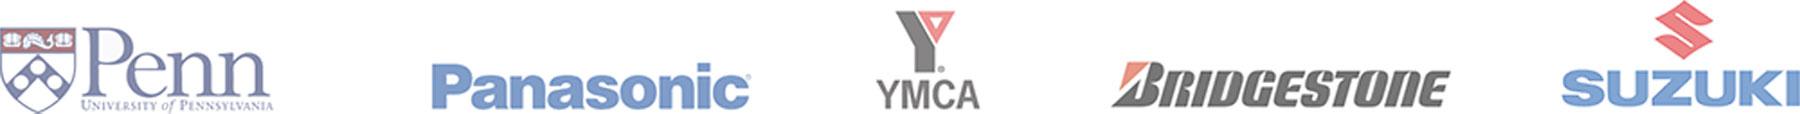 mdm-clients-logo